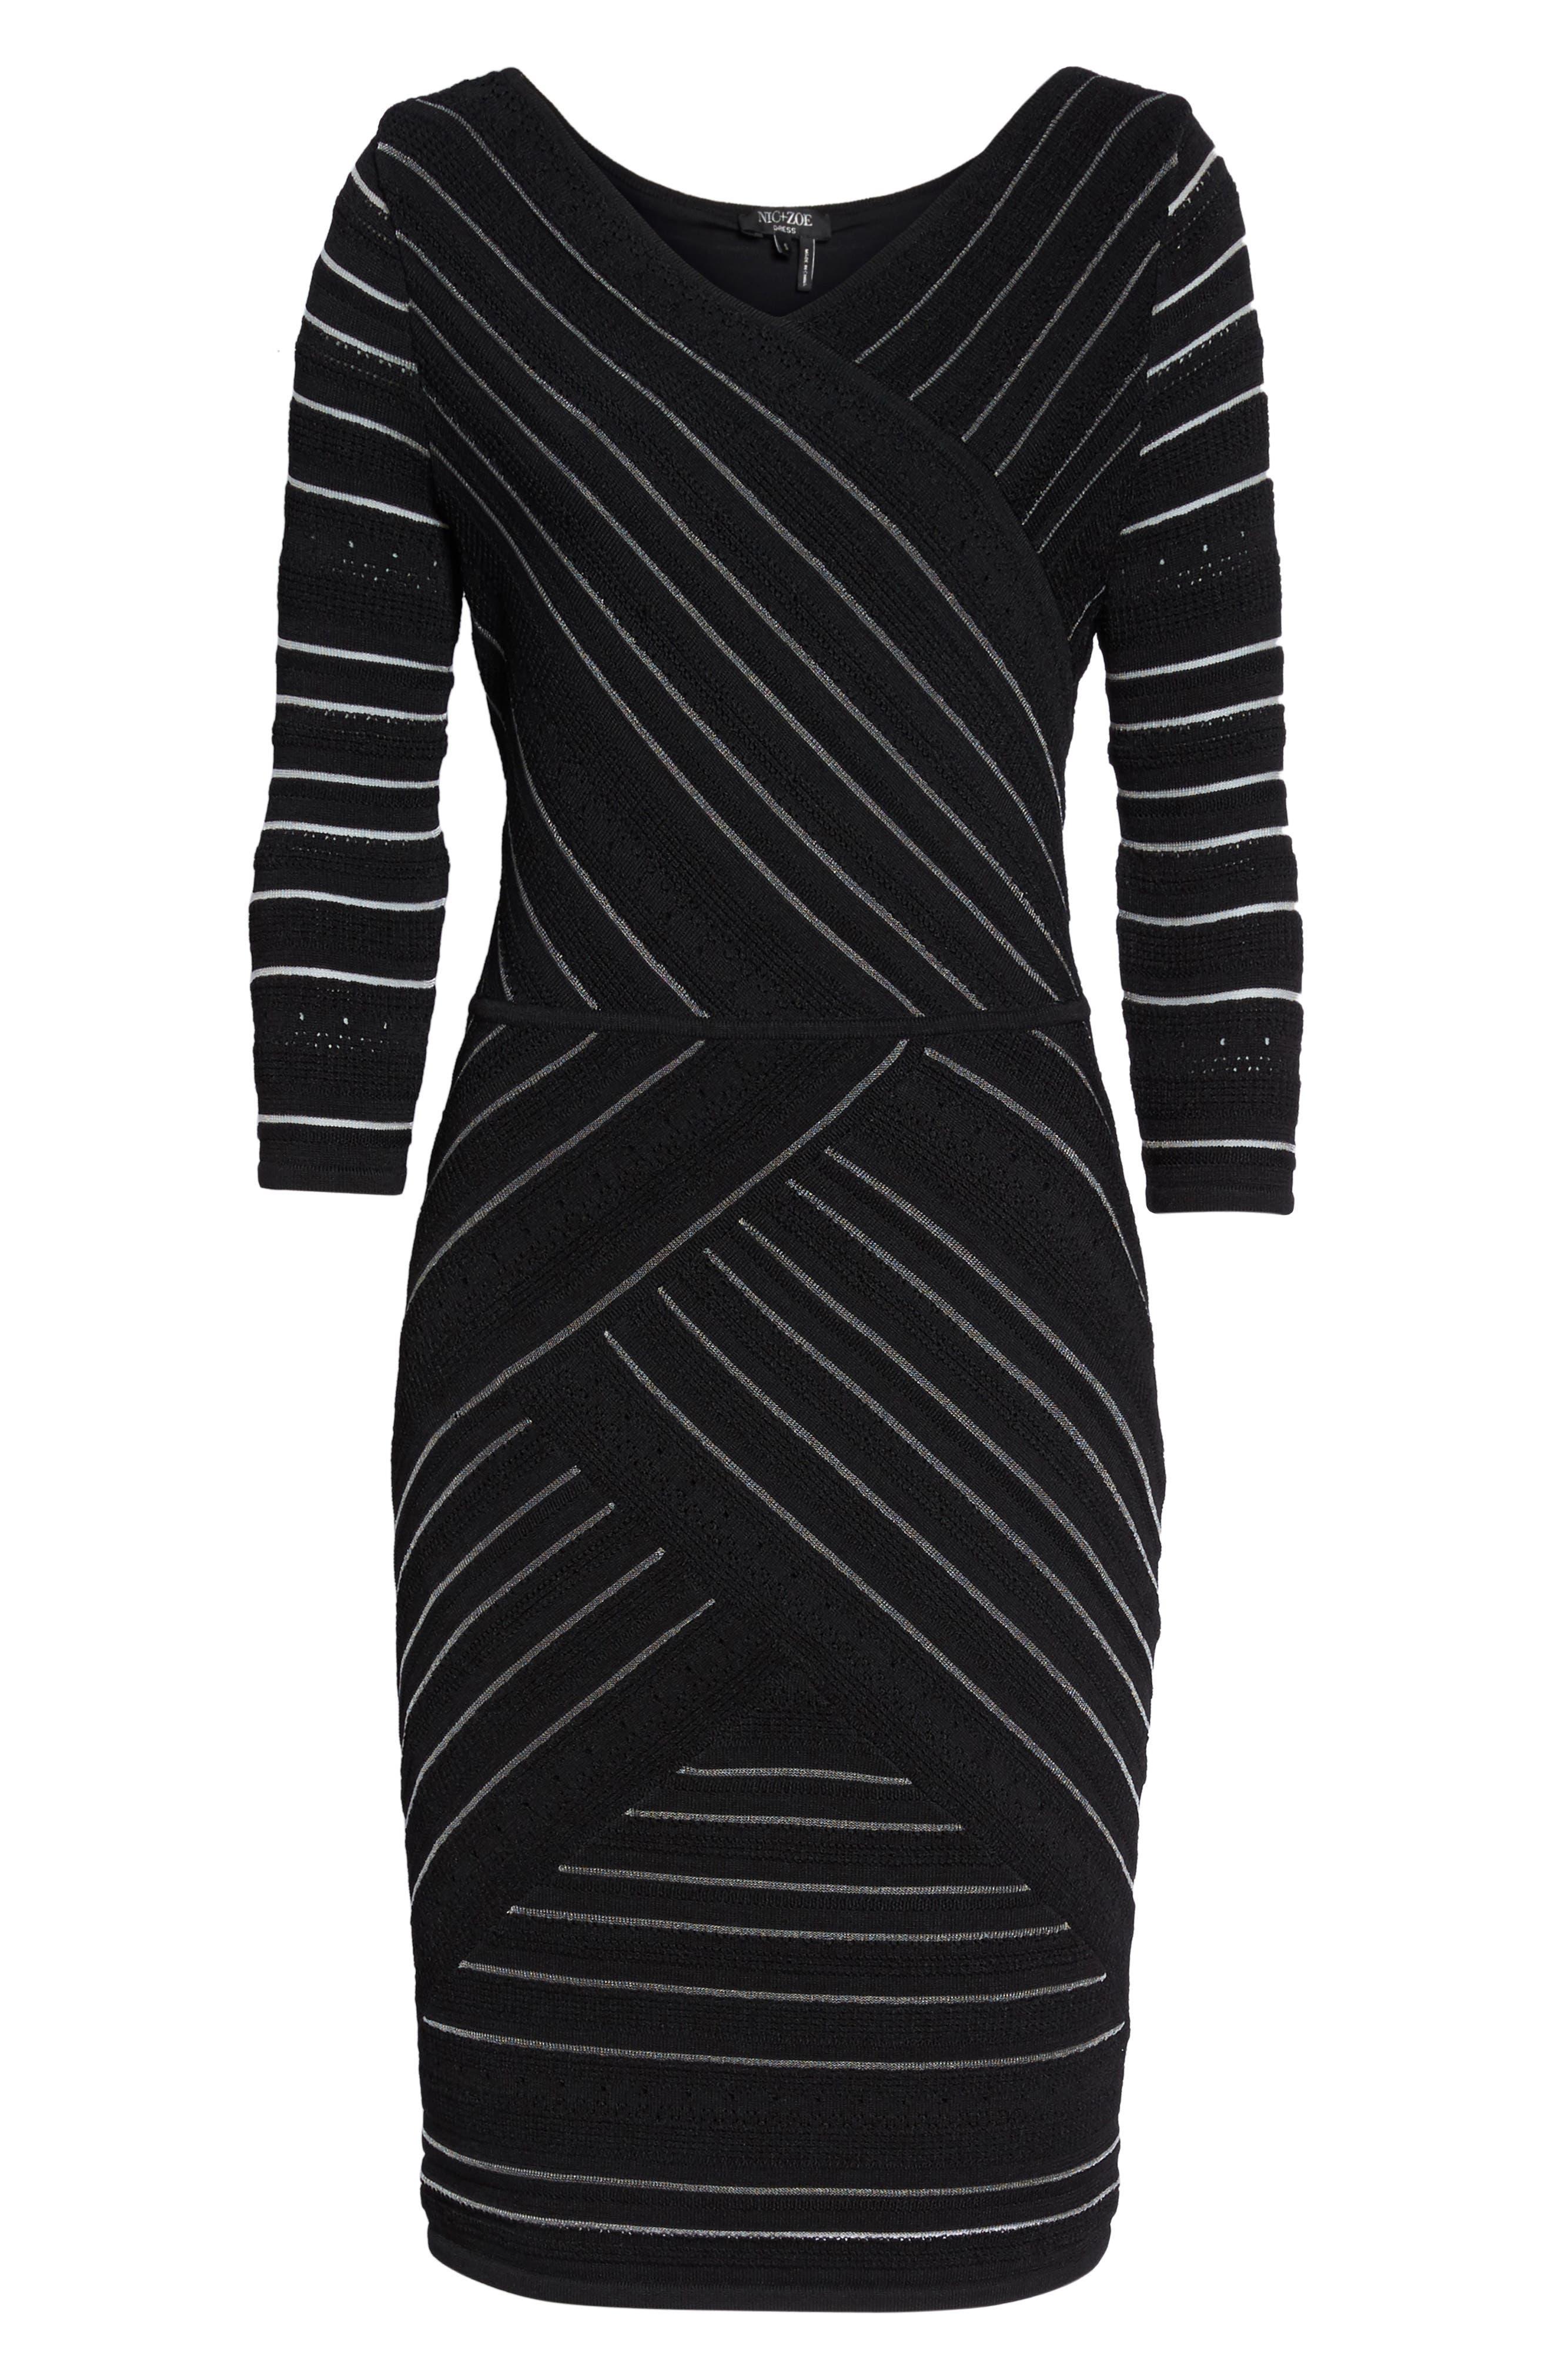 NIC+ ZOE Wrapped Up Sheath Dress,                             Alternate thumbnail 6, color,                             Black Onyx